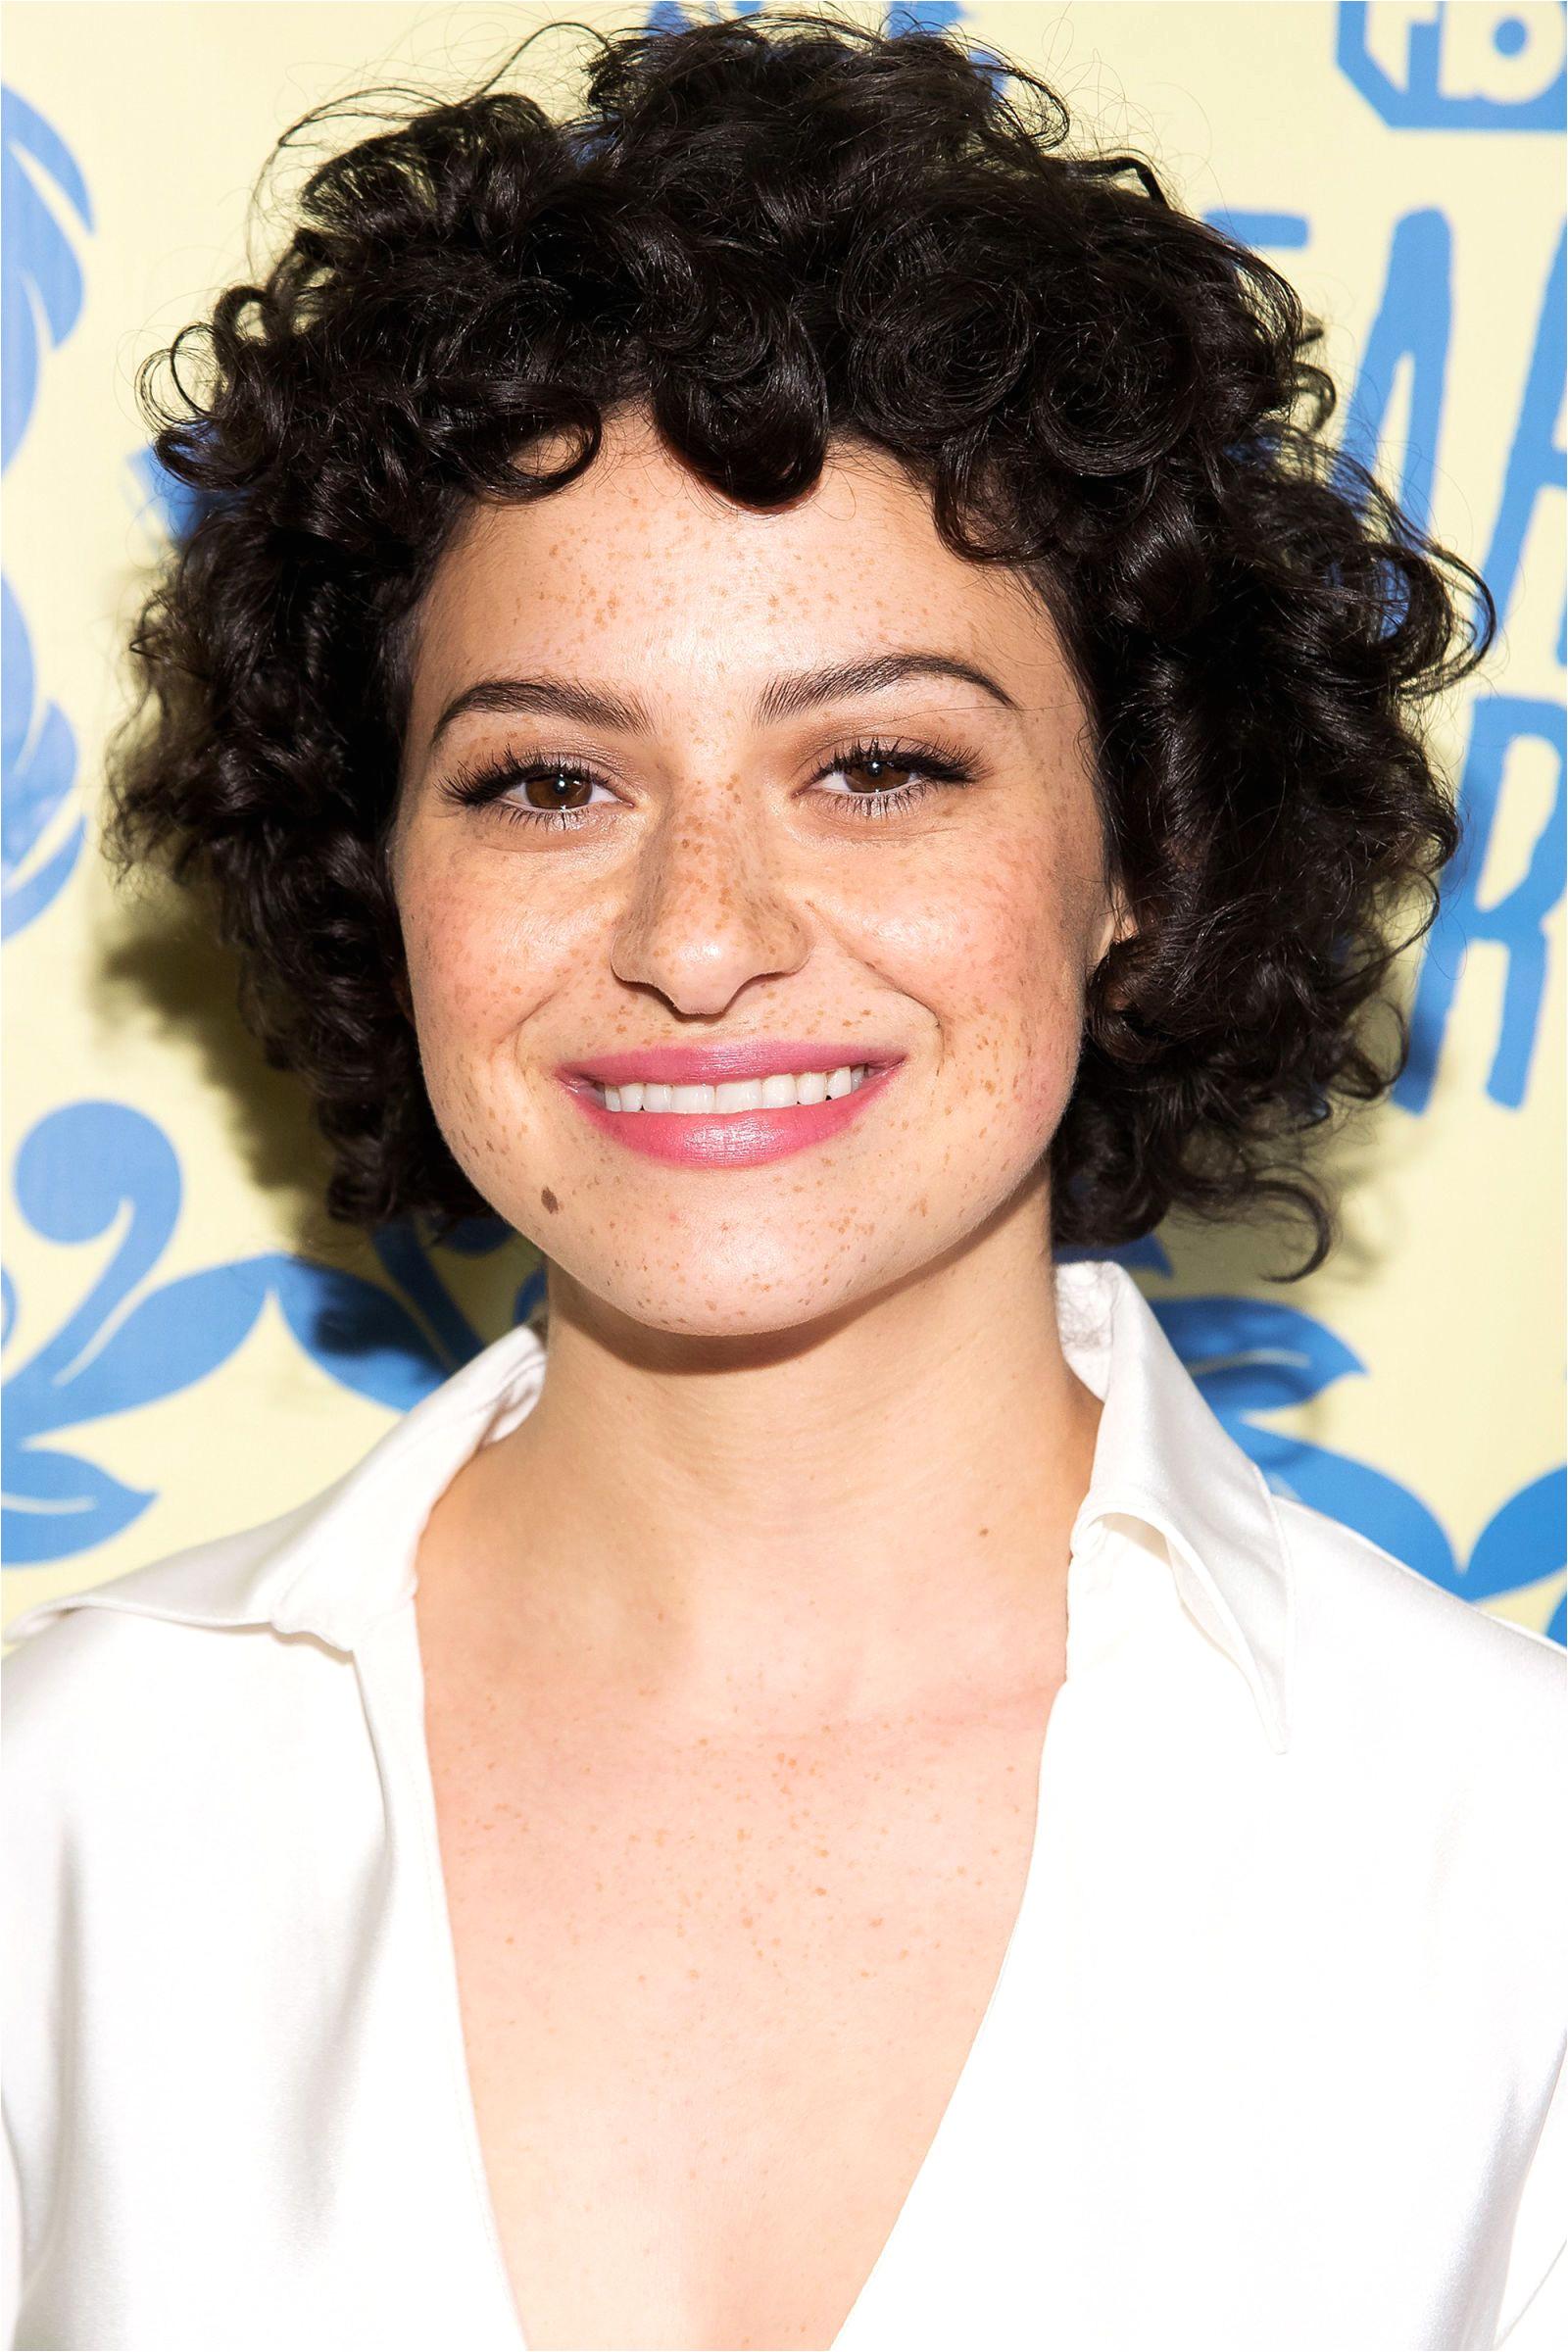 Amusing Hair themes Very Curly Hairstyles Fresh Curly Hair 0d Luxury Hairstyles for Curly Frizzy Hair